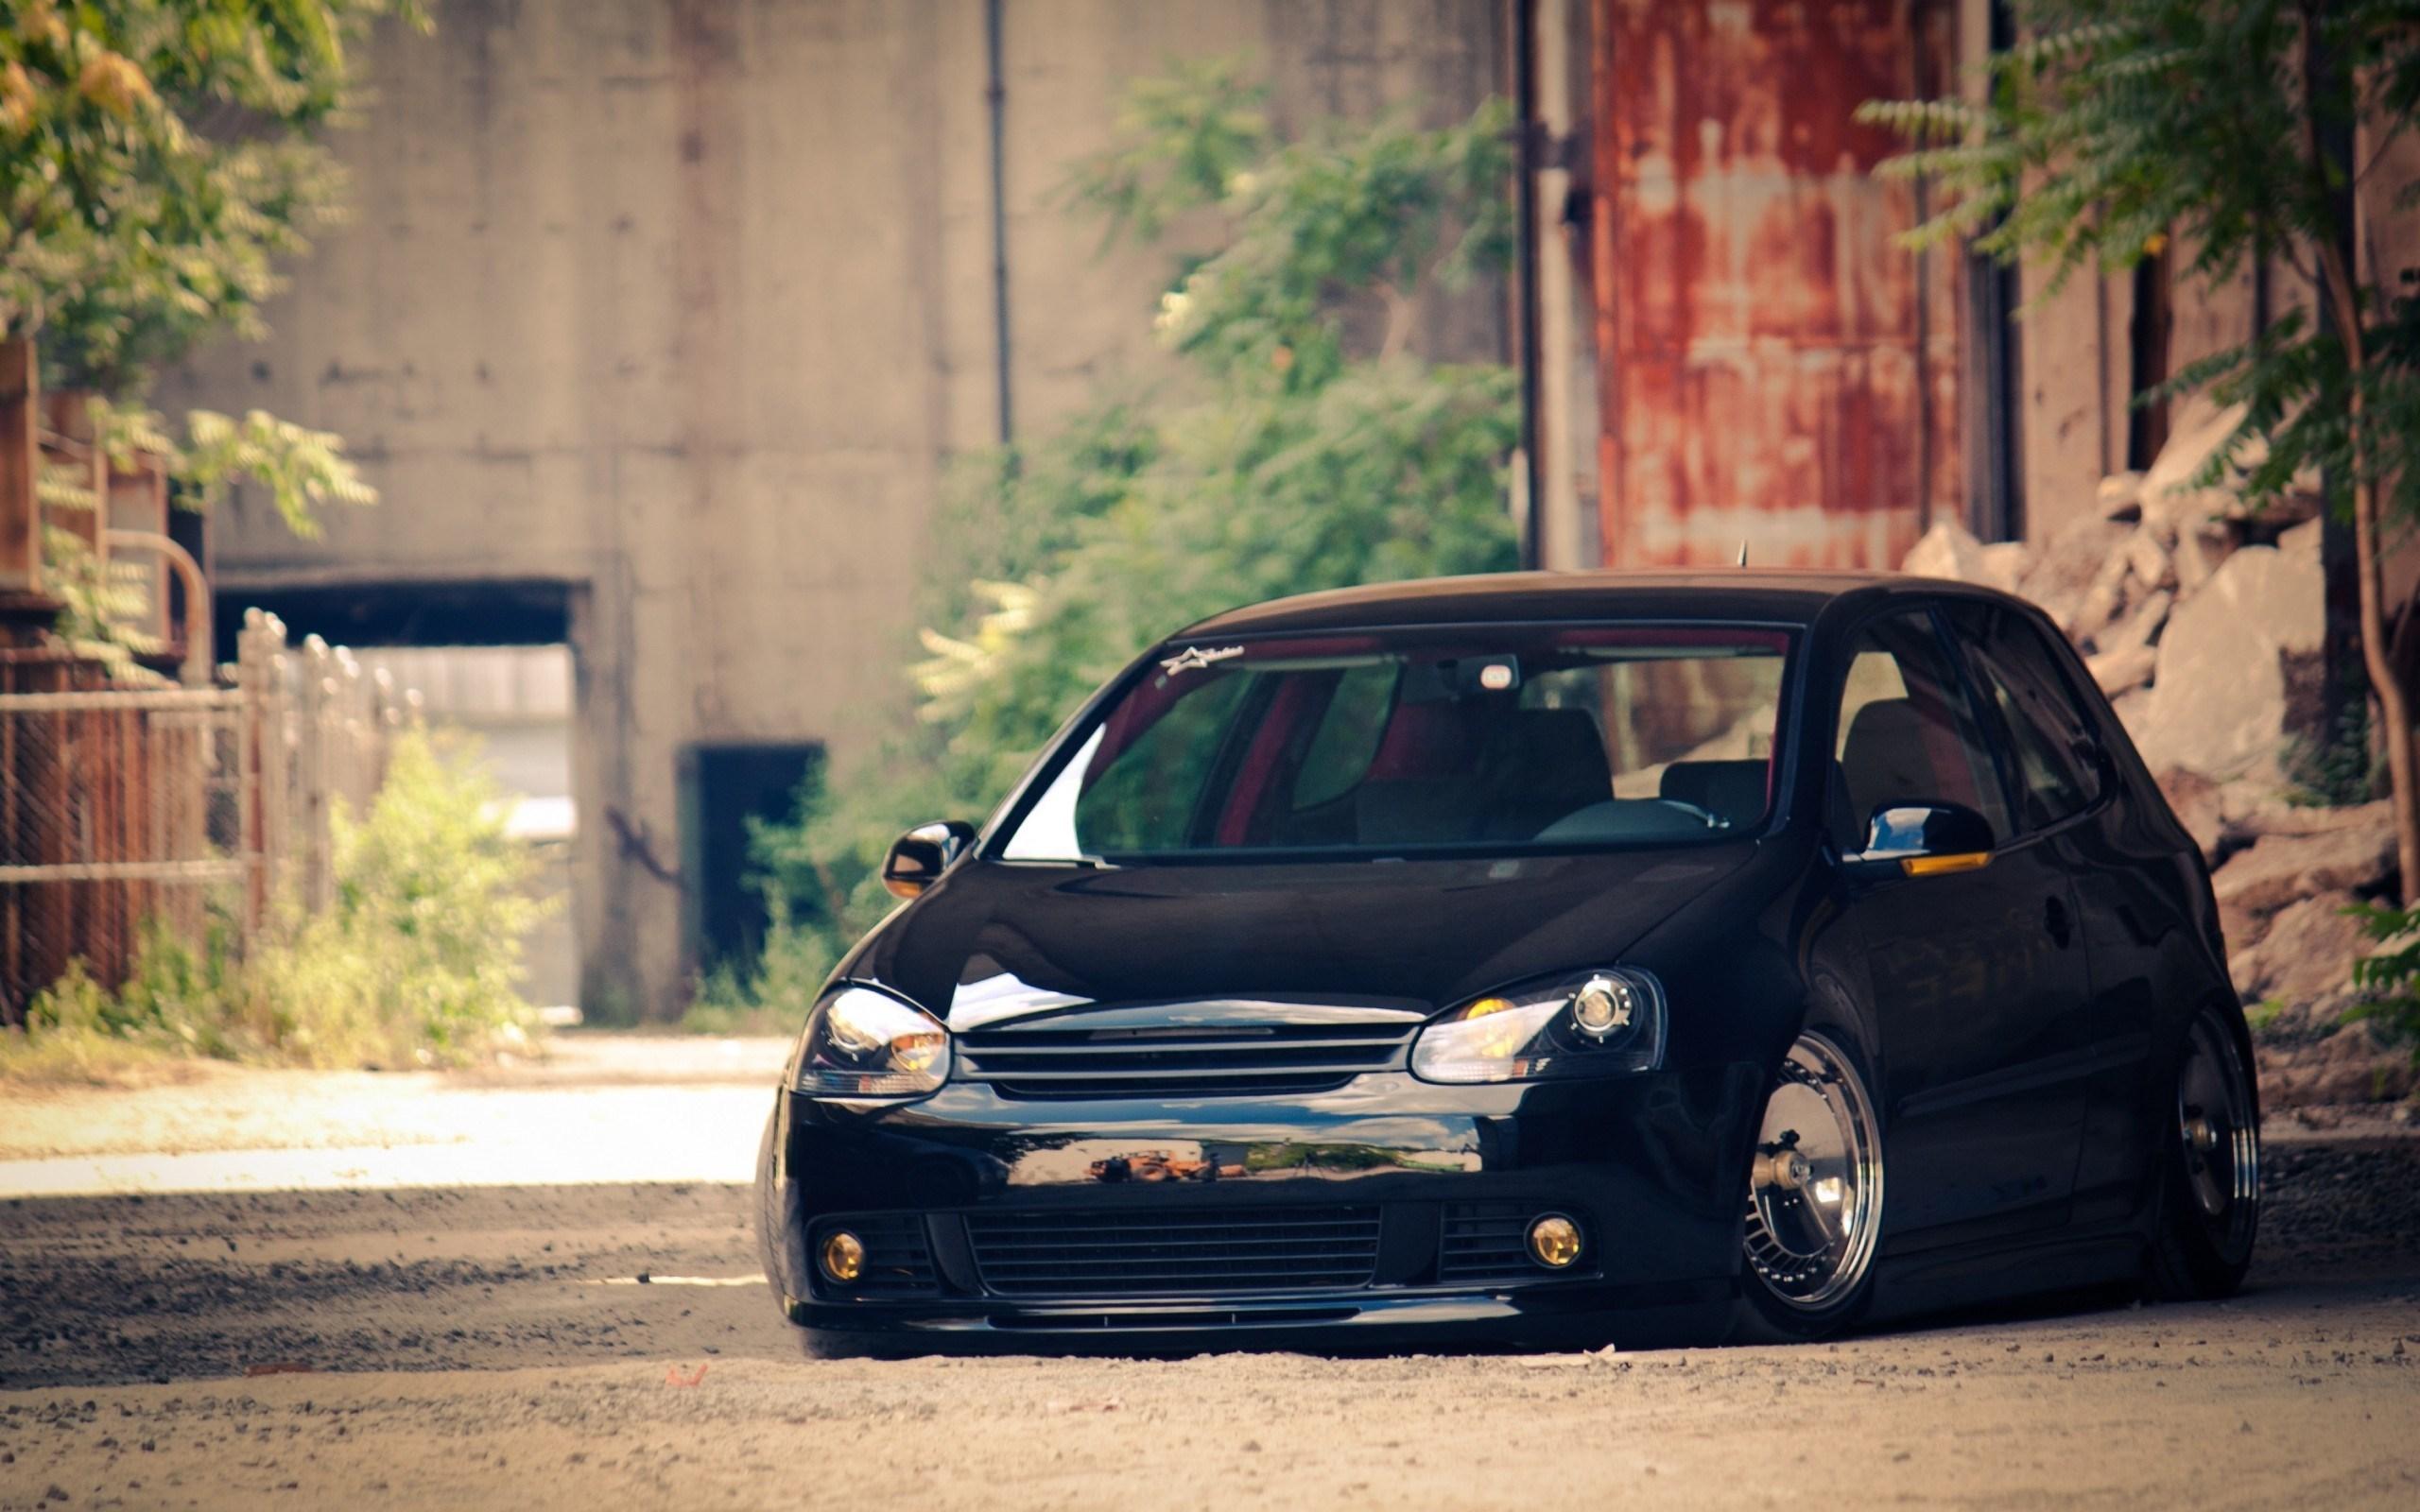 Volkswagen Golf Black Tuning Photo